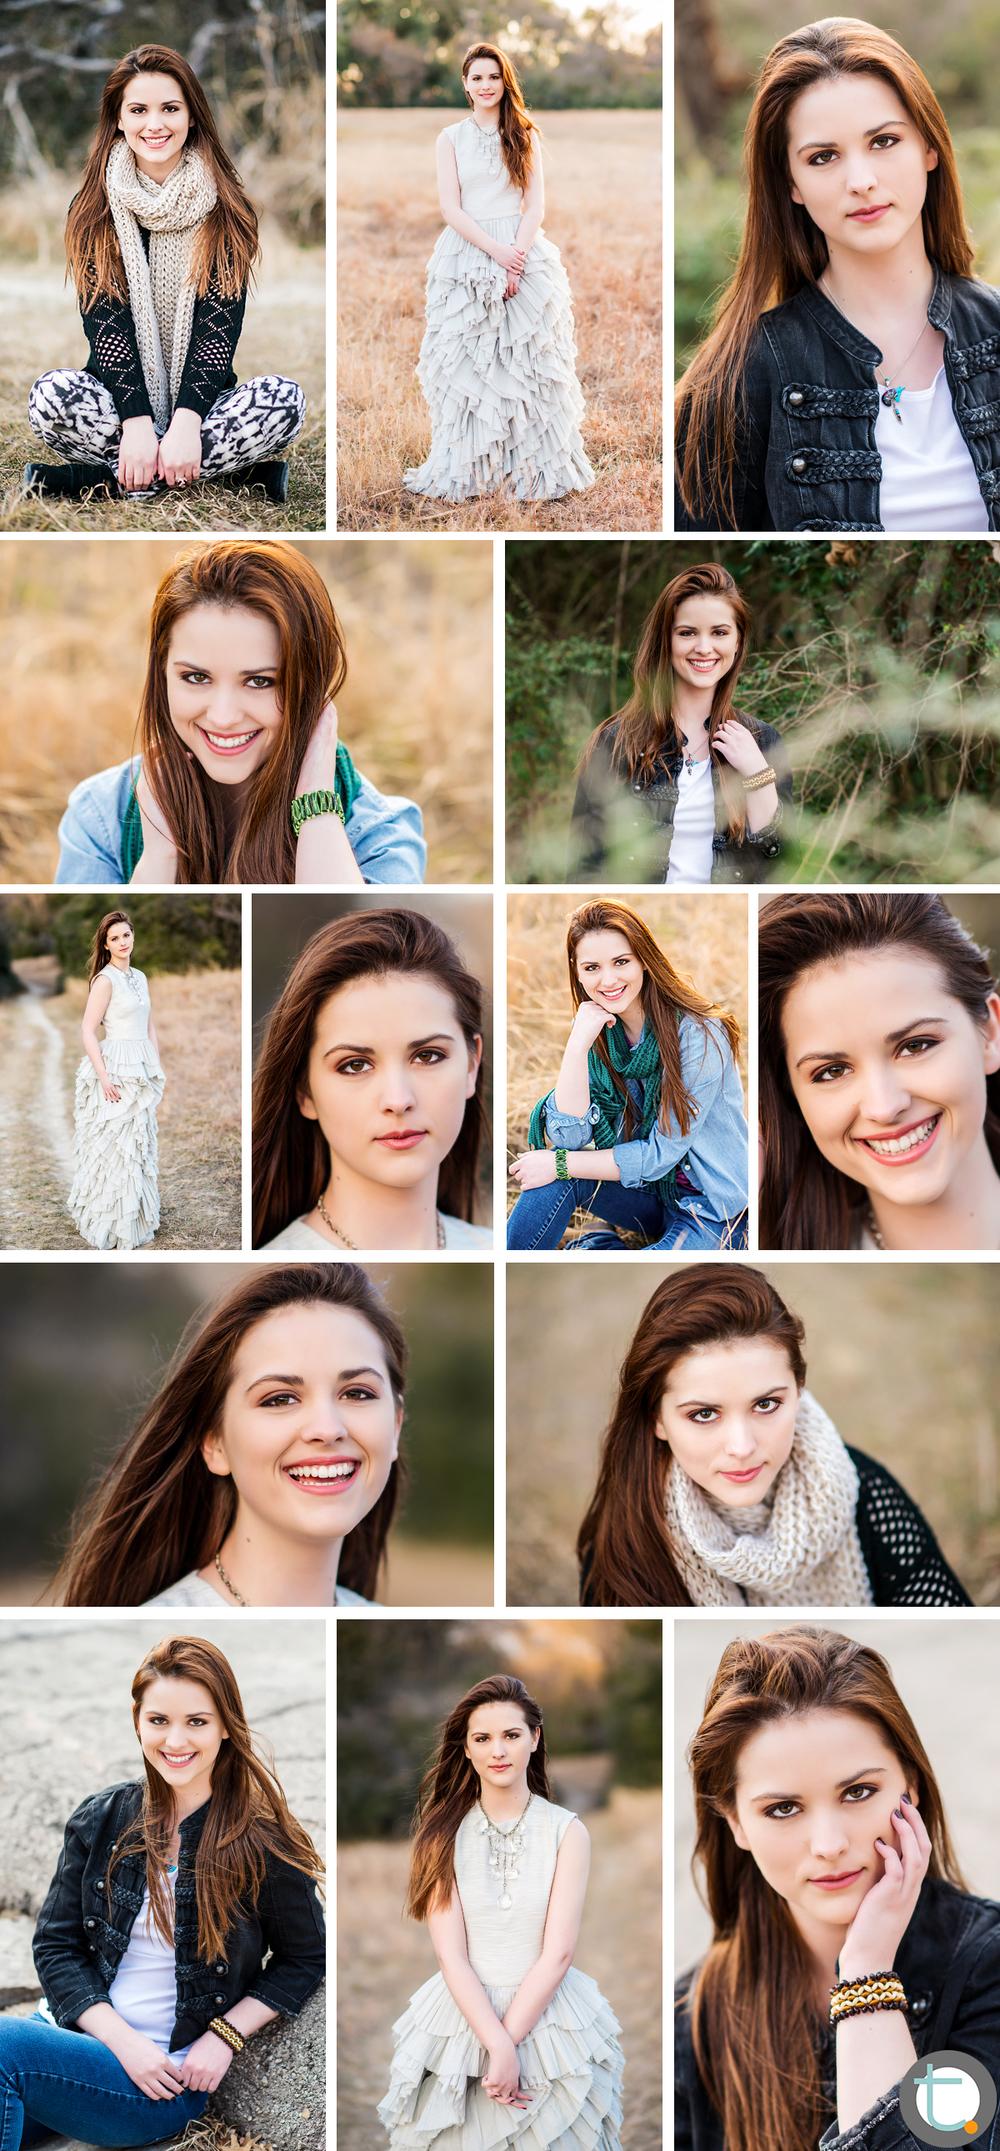 dallas_senior_portrait_2014_tracyallynphotograph_lily